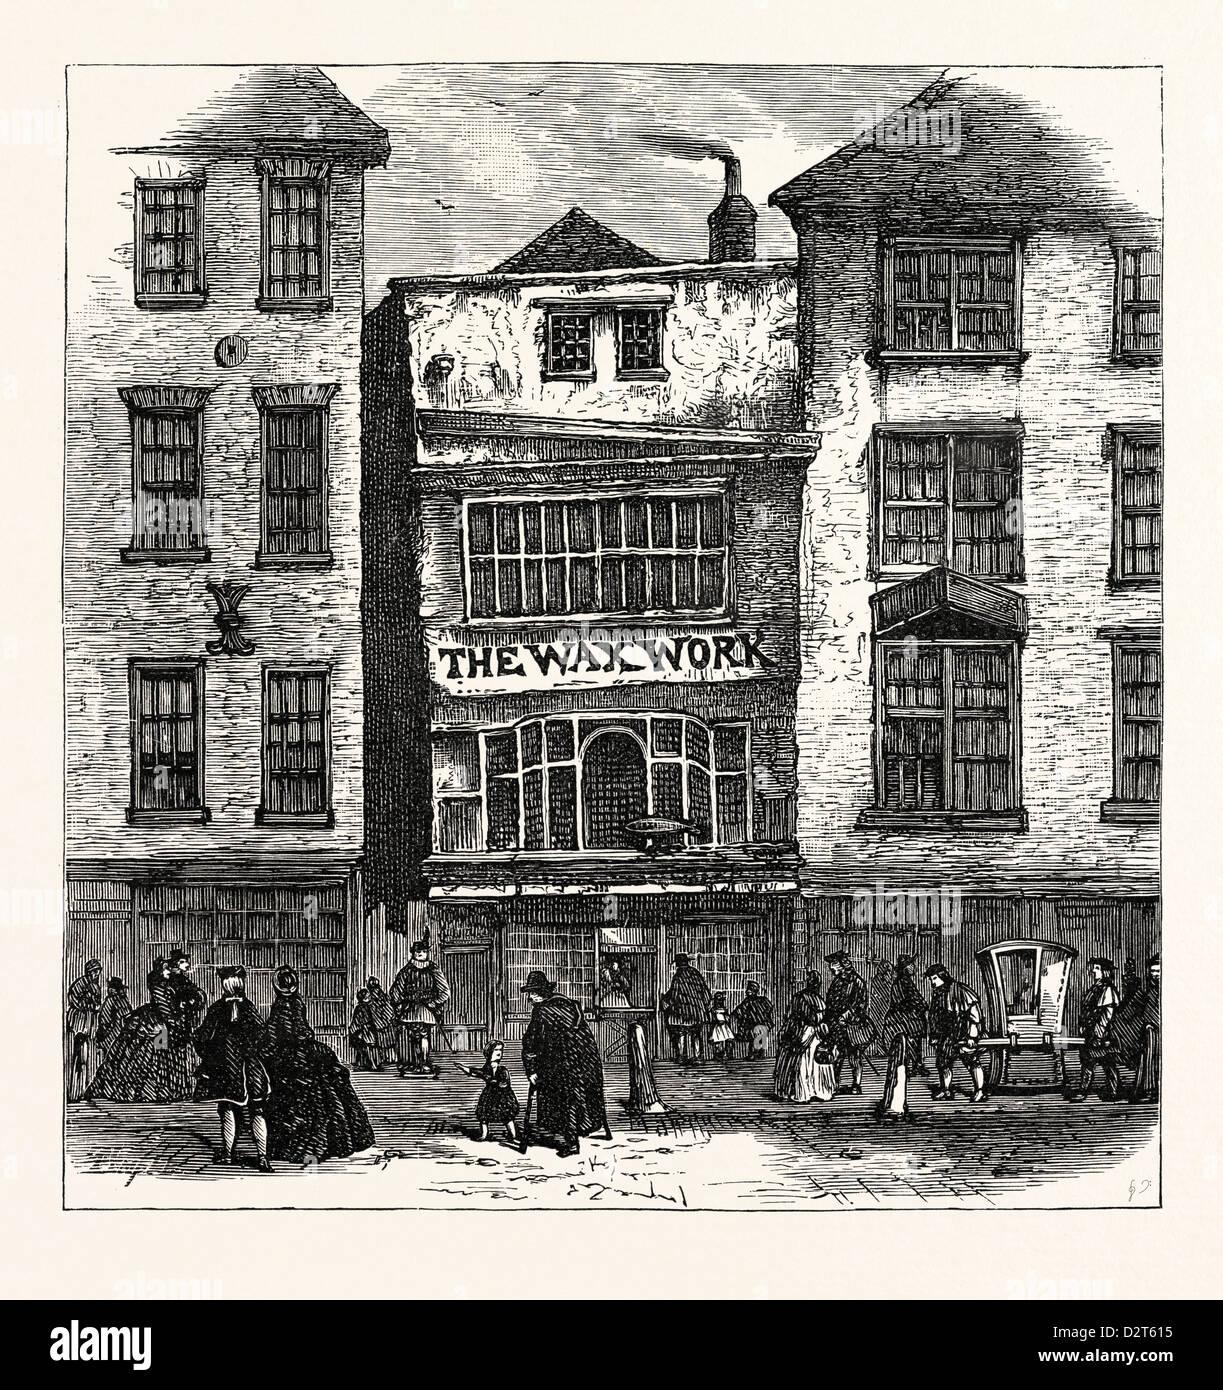 MRS. SALMON'S WAXWORK FLEET STREET: PALACE OF HENRY VIII. AND CARDINAL WOLSEY LONDON - Stock Image